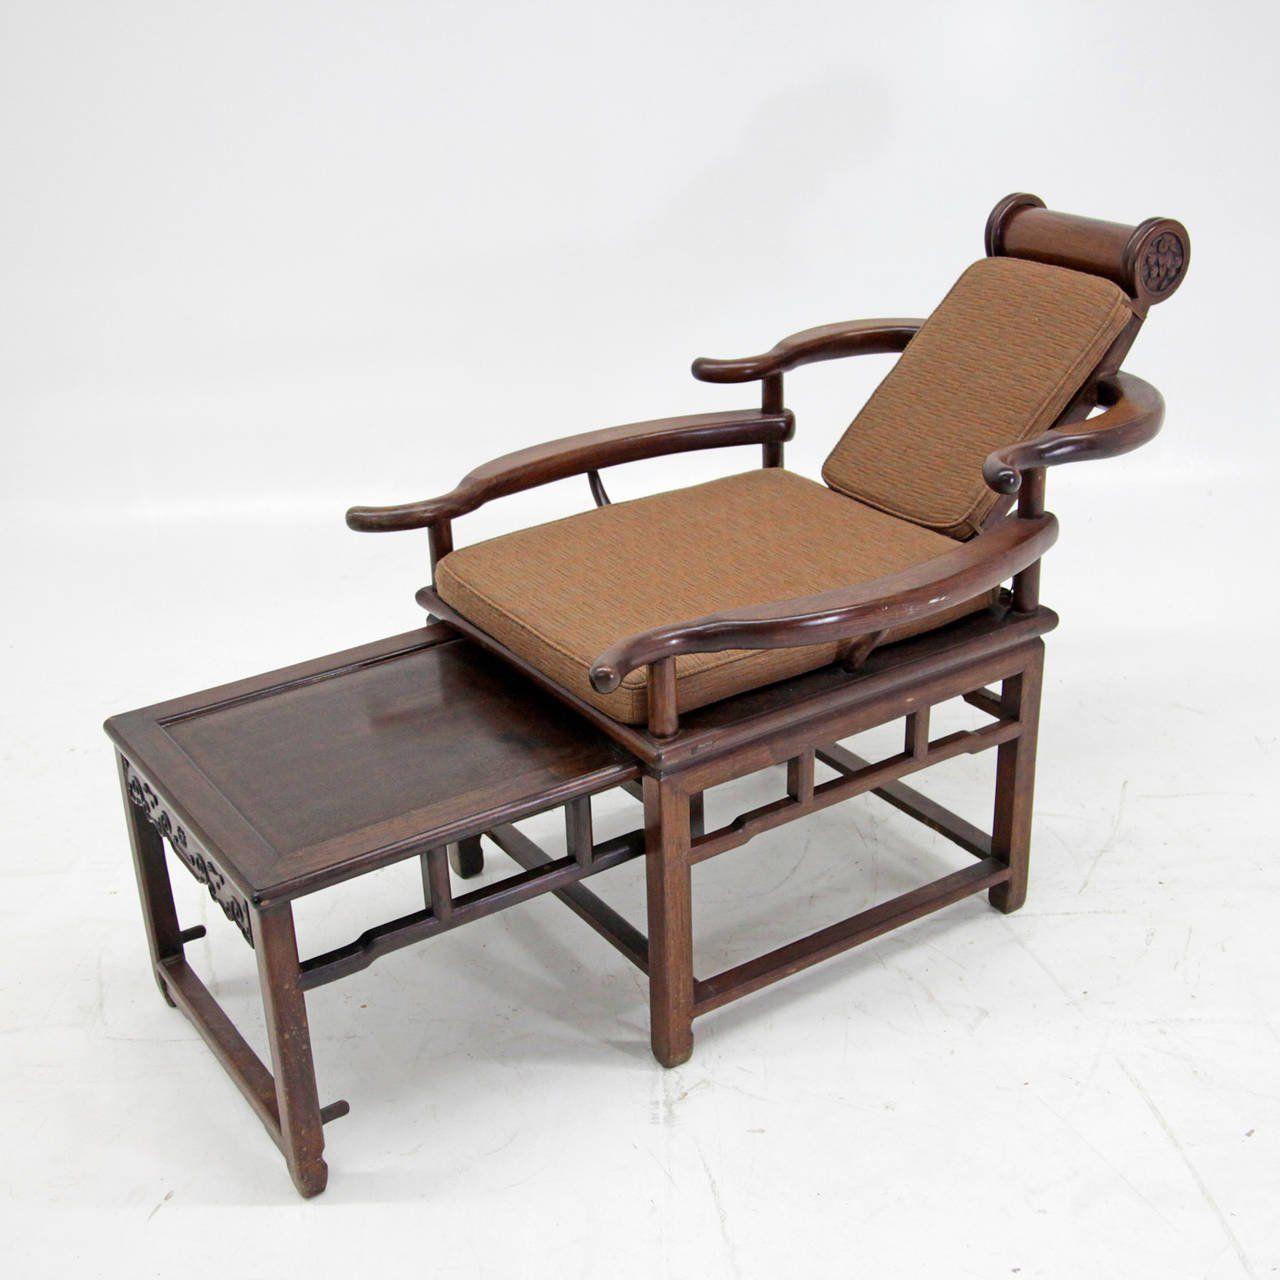 Miraculous Exceptional Asian Recliner Or Deck Chair Circa 1900 1910 Creativecarmelina Interior Chair Design Creativecarmelinacom